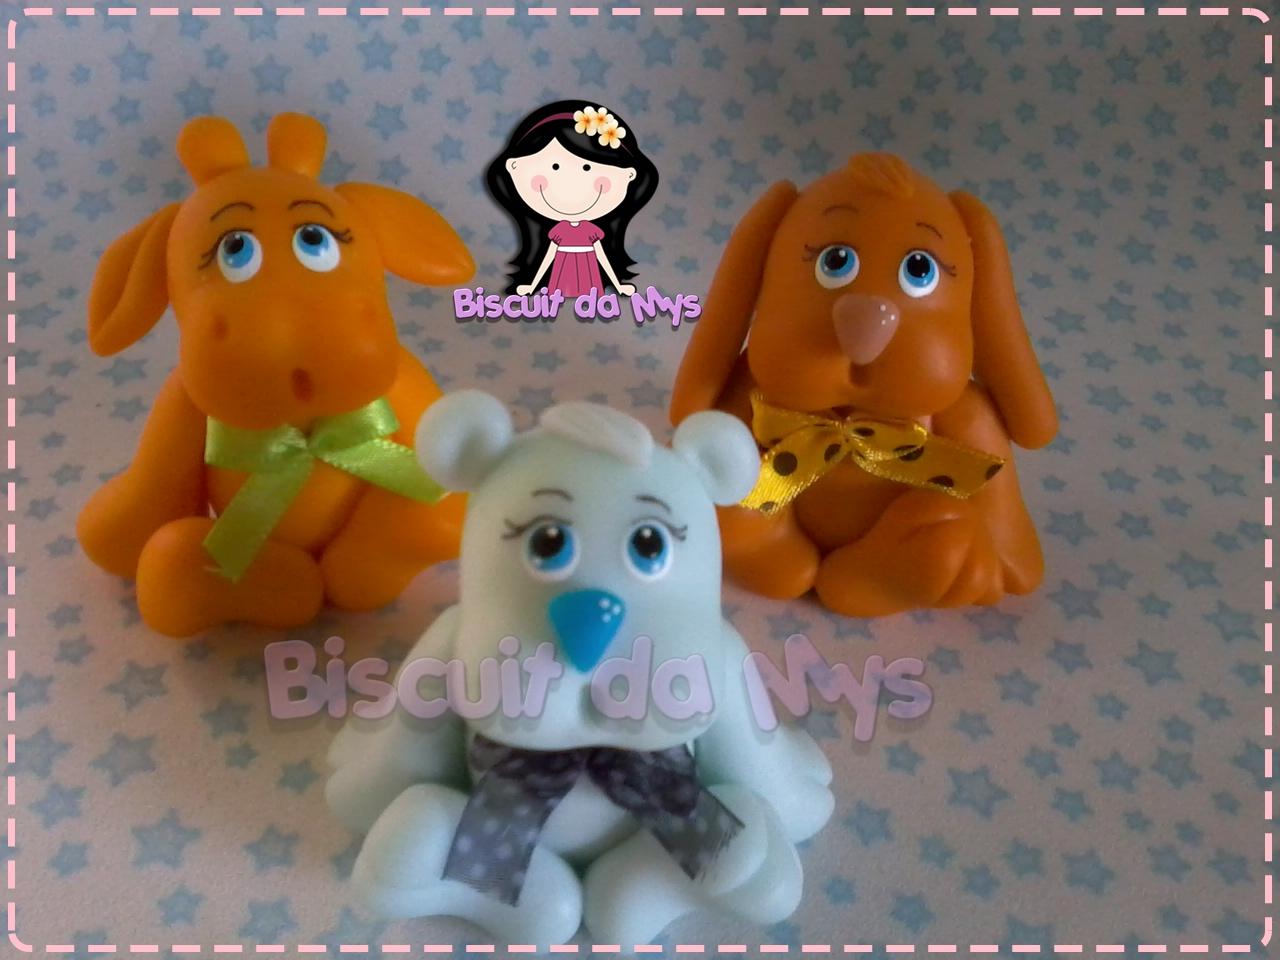 BISCUIT DA MYS: bichinhos mini pets #833F08 1280x960